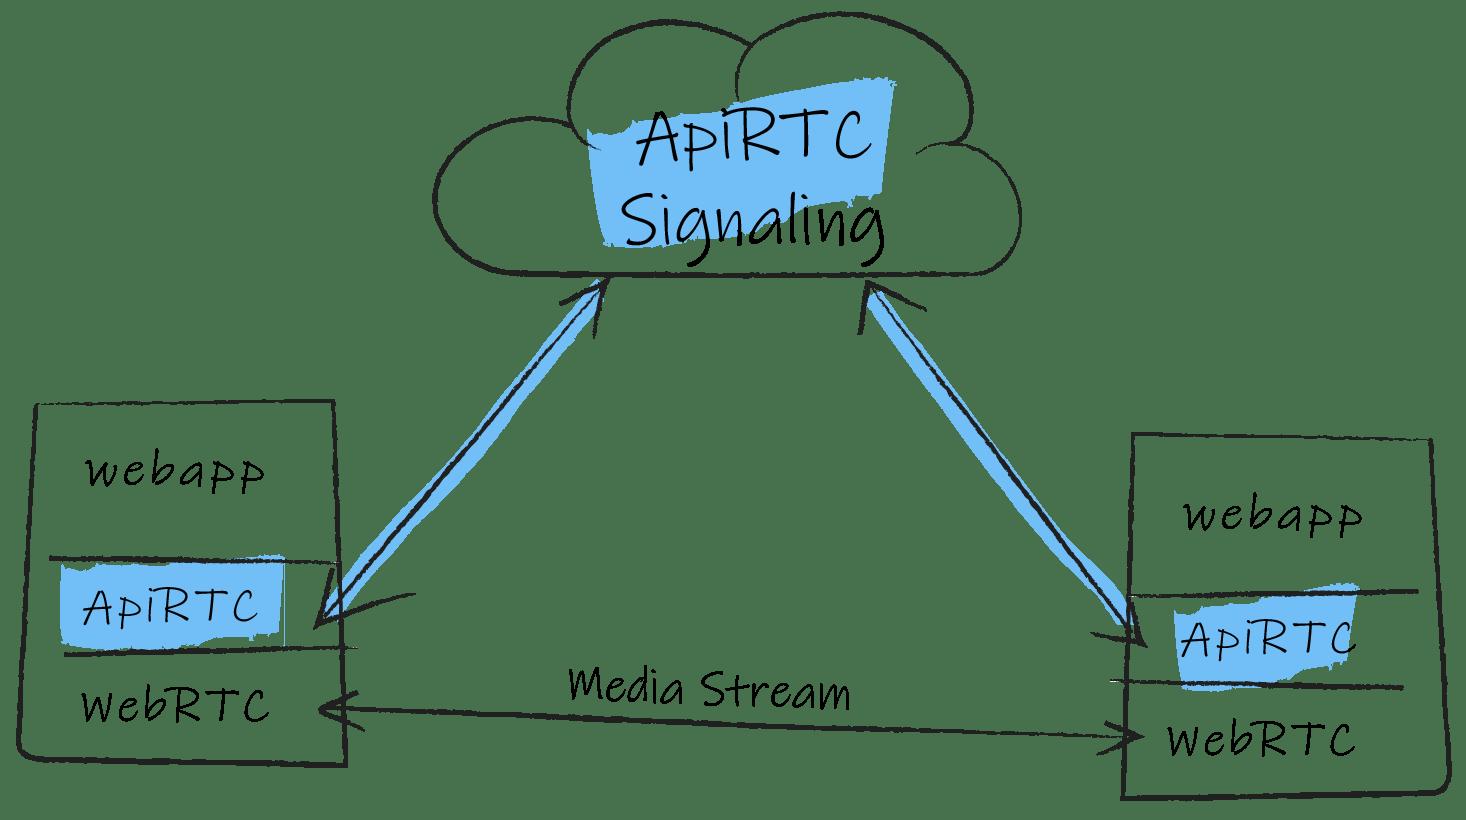 signalisation ApiRTC